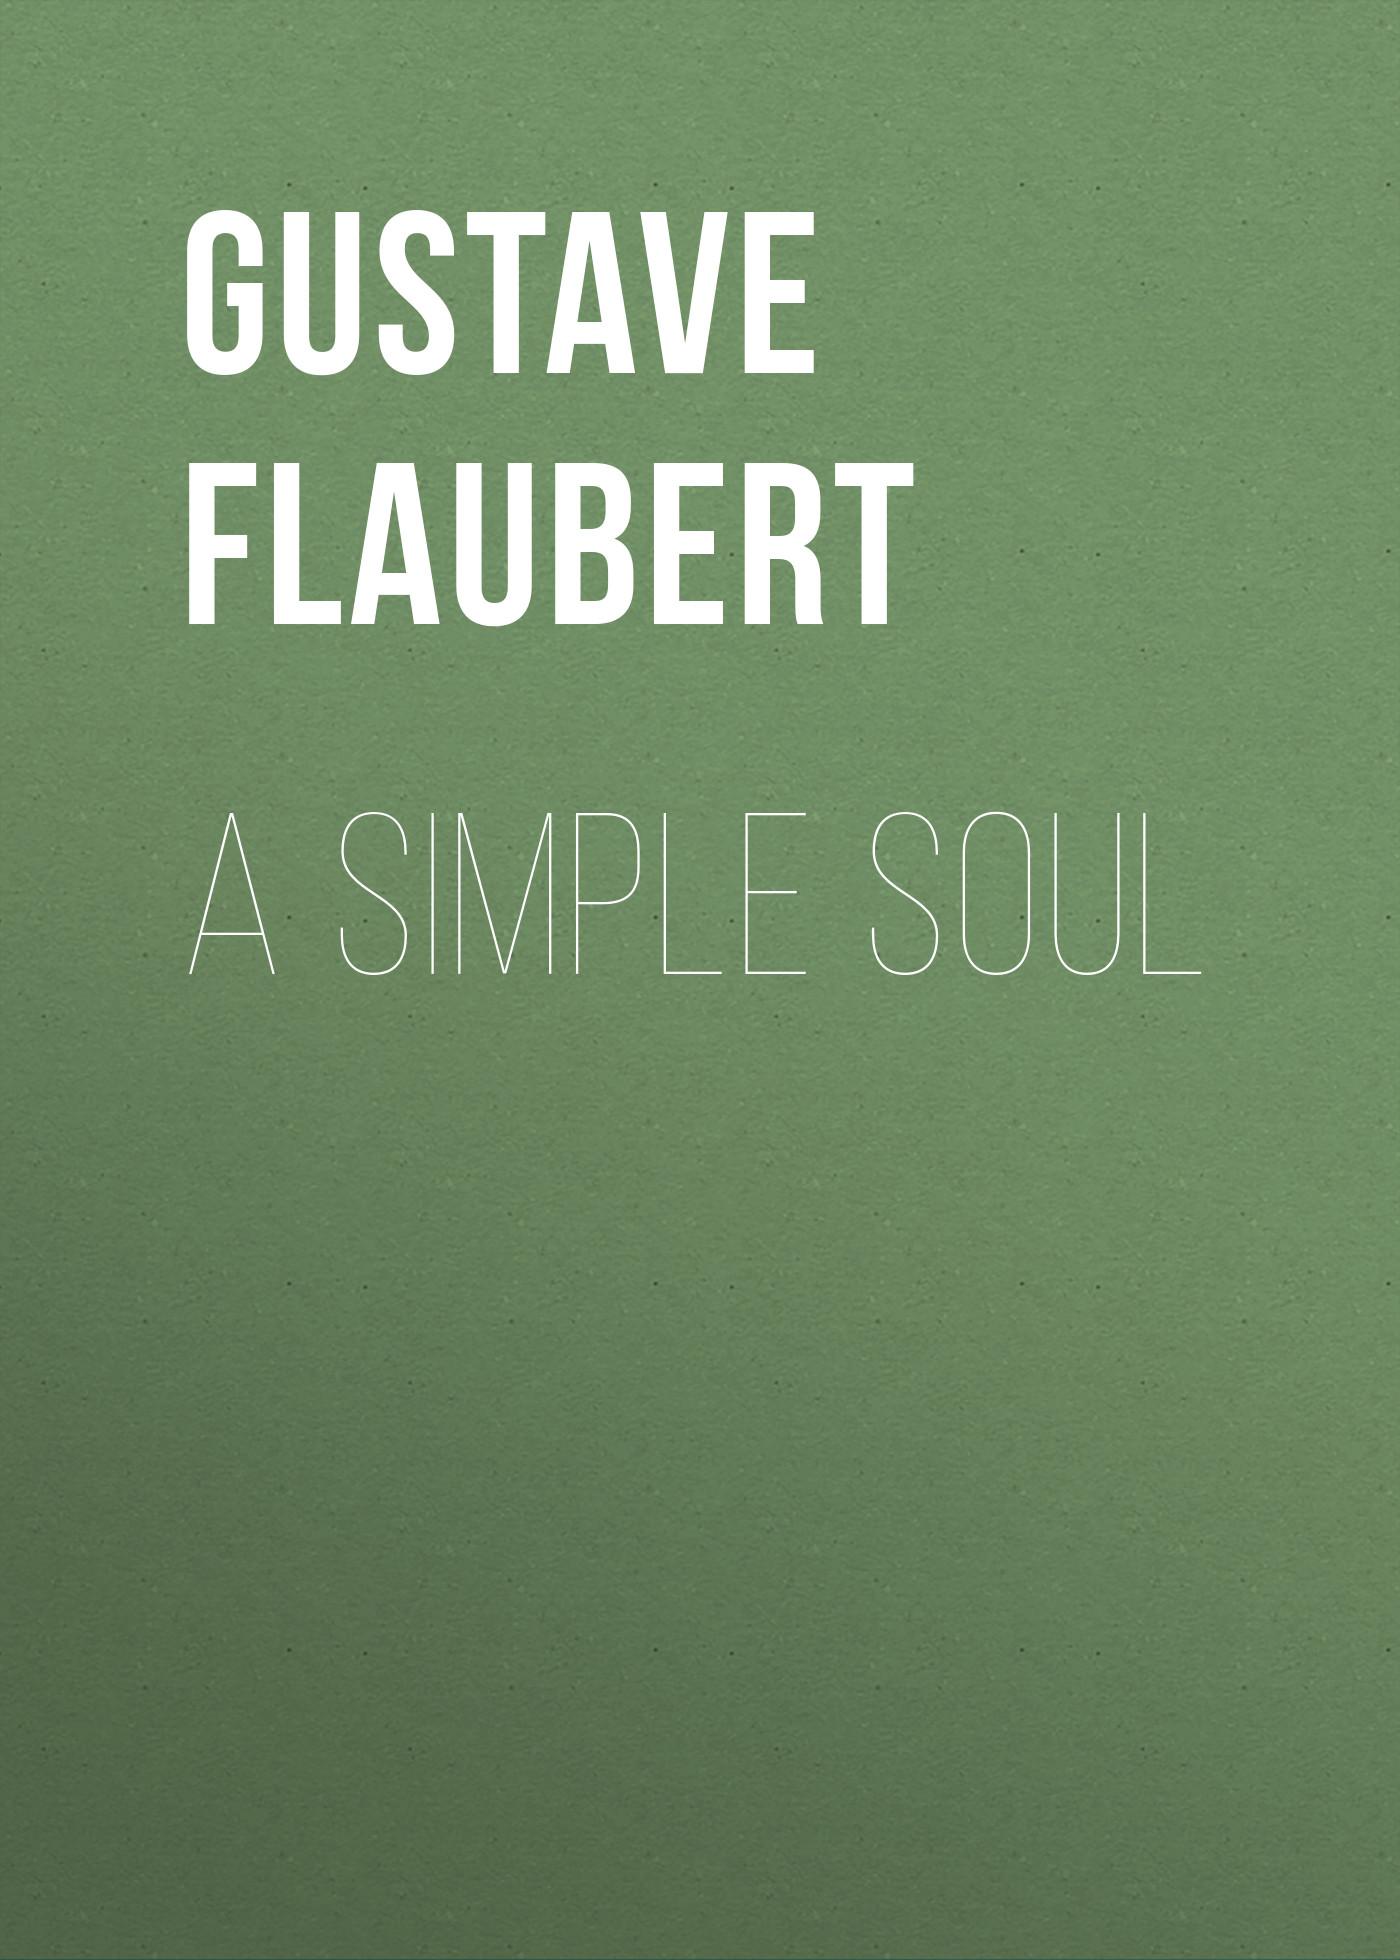 Gustave Flaubert A Simple Soul